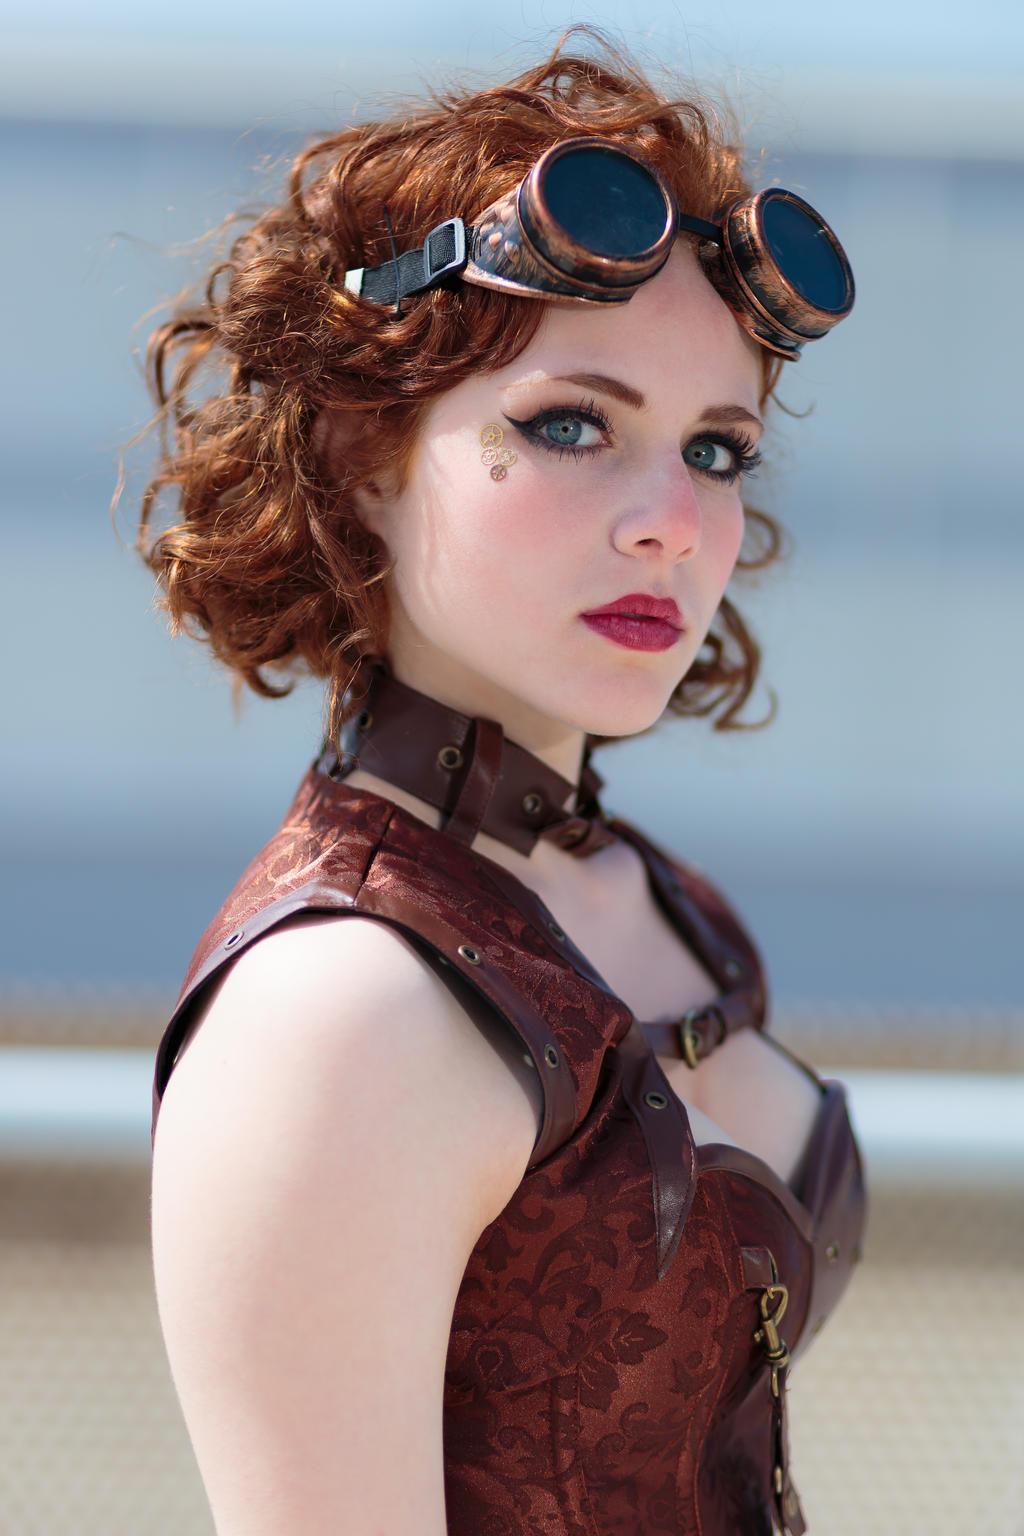 Bien-aimé Steampunk Lady by MarcoFiorilli on DeviantArt VI08